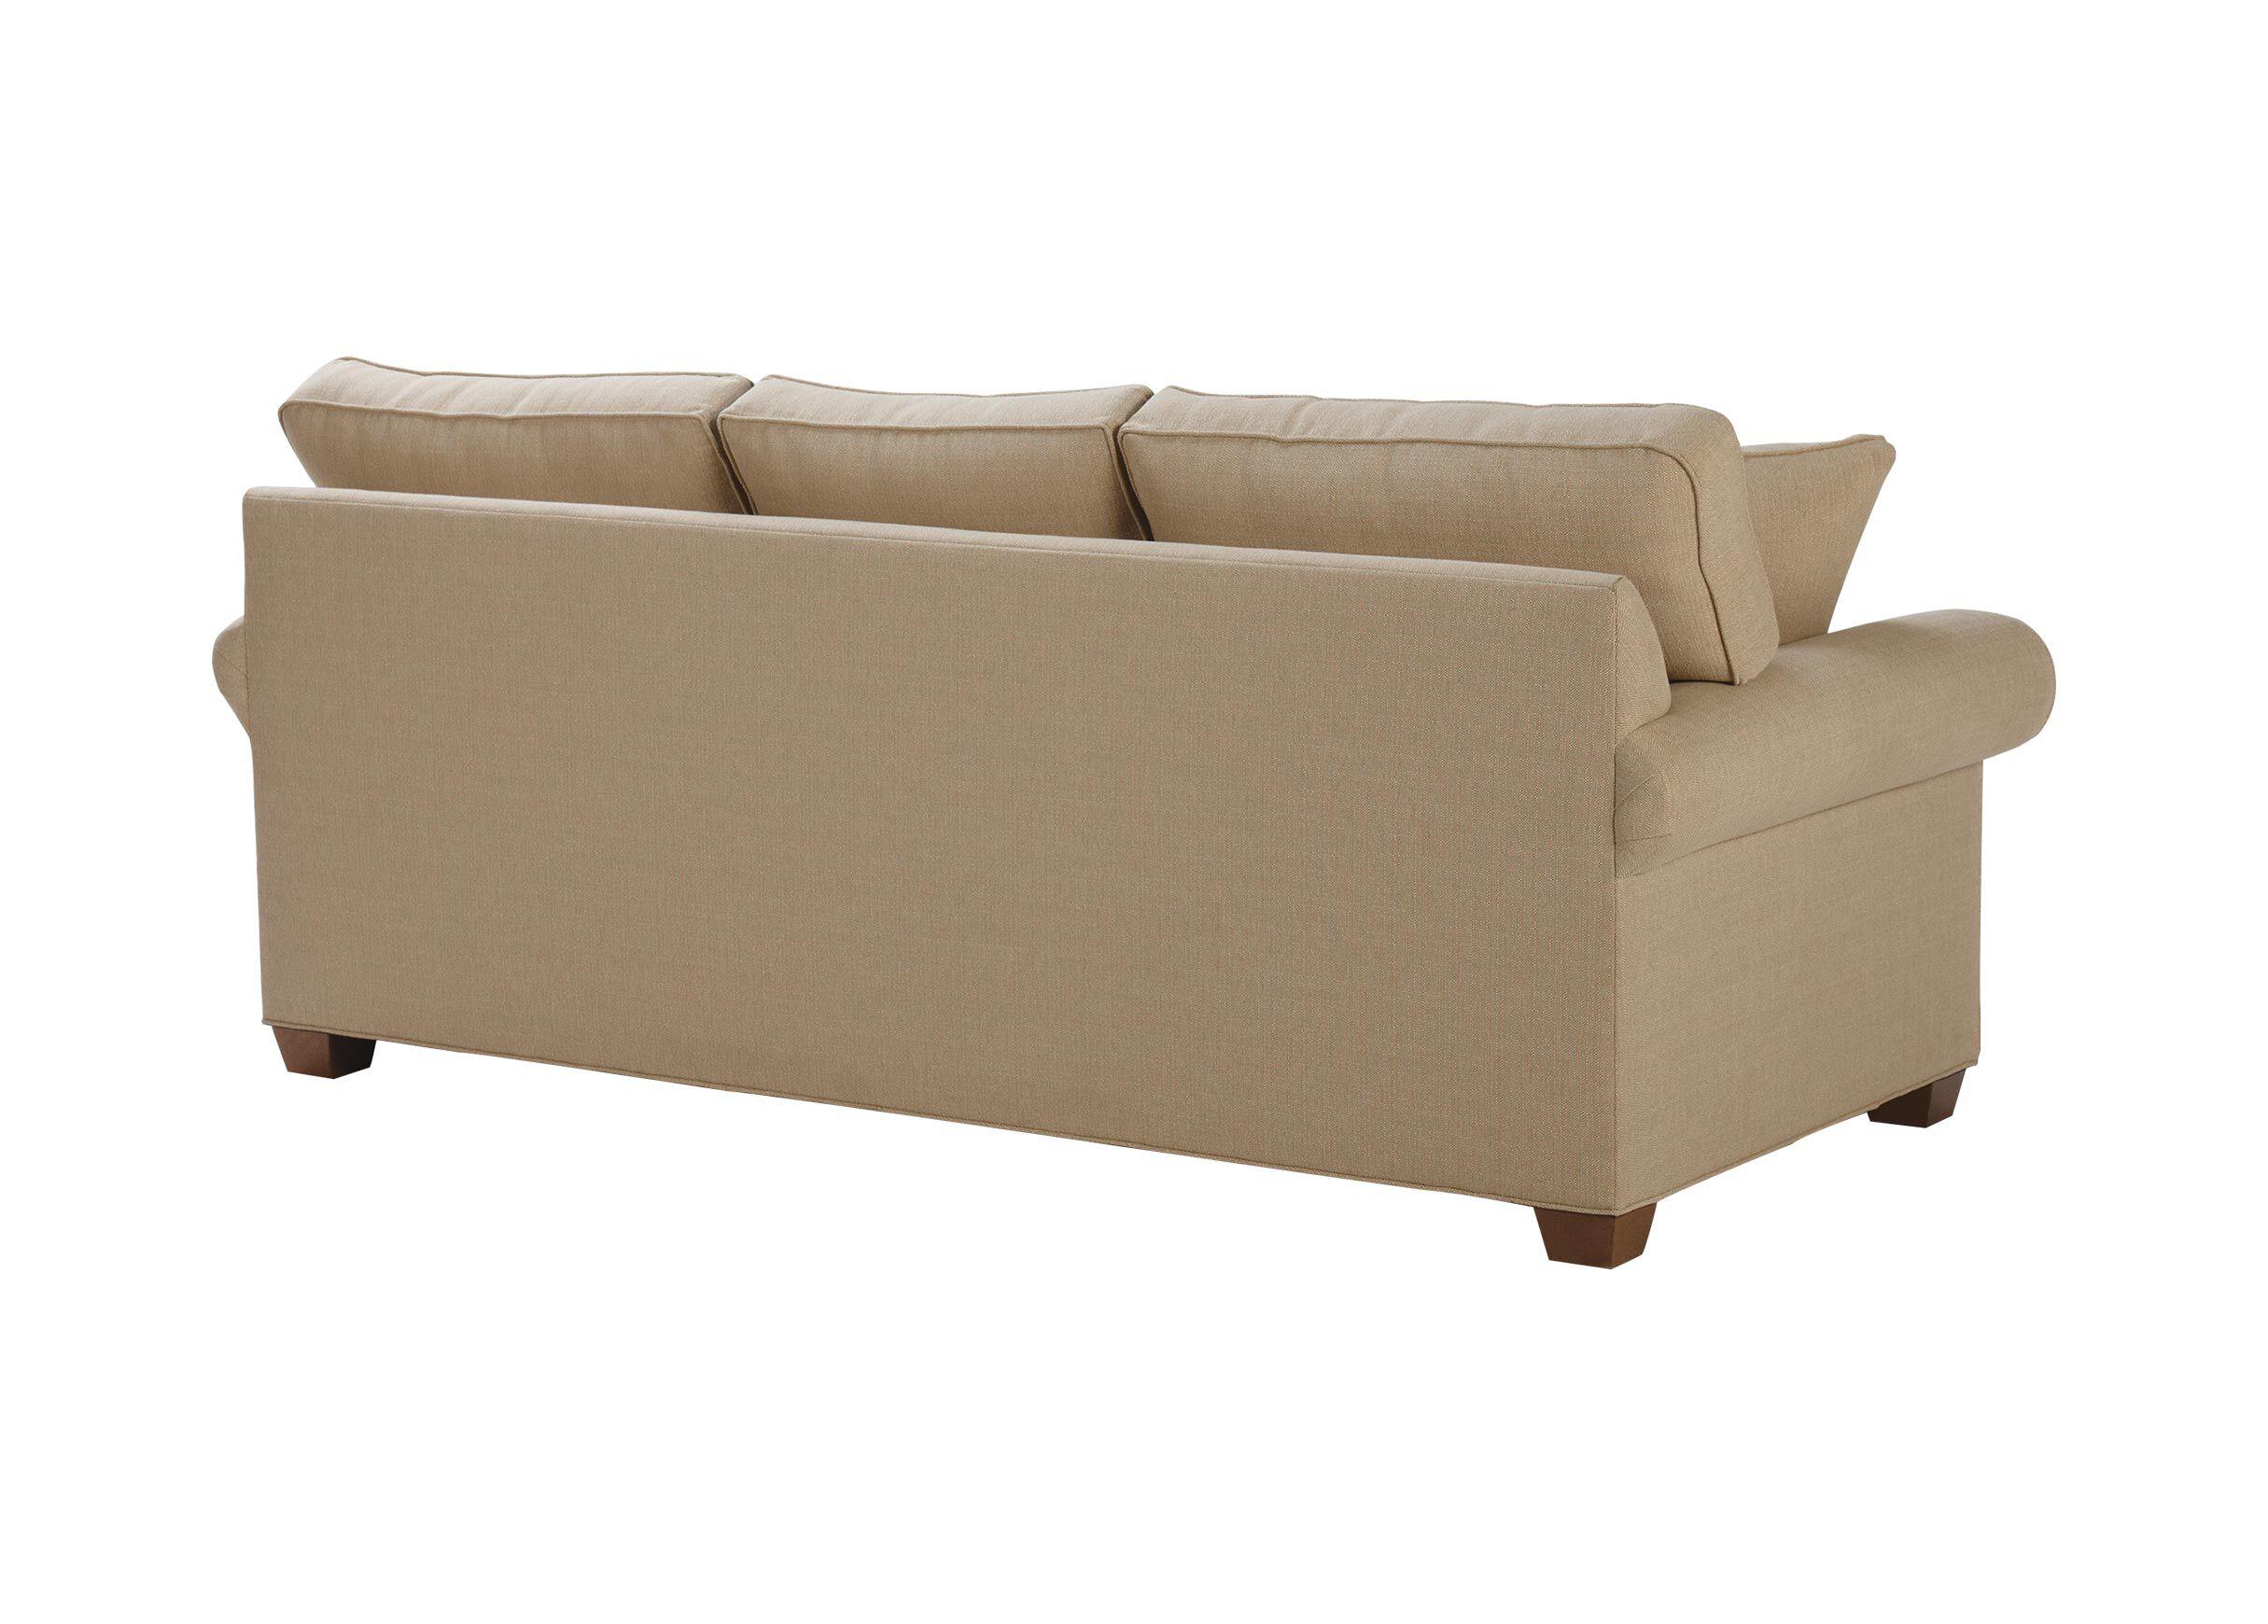 rolled arm sofa nz small size beds bennett roll 78 quot ethan allen